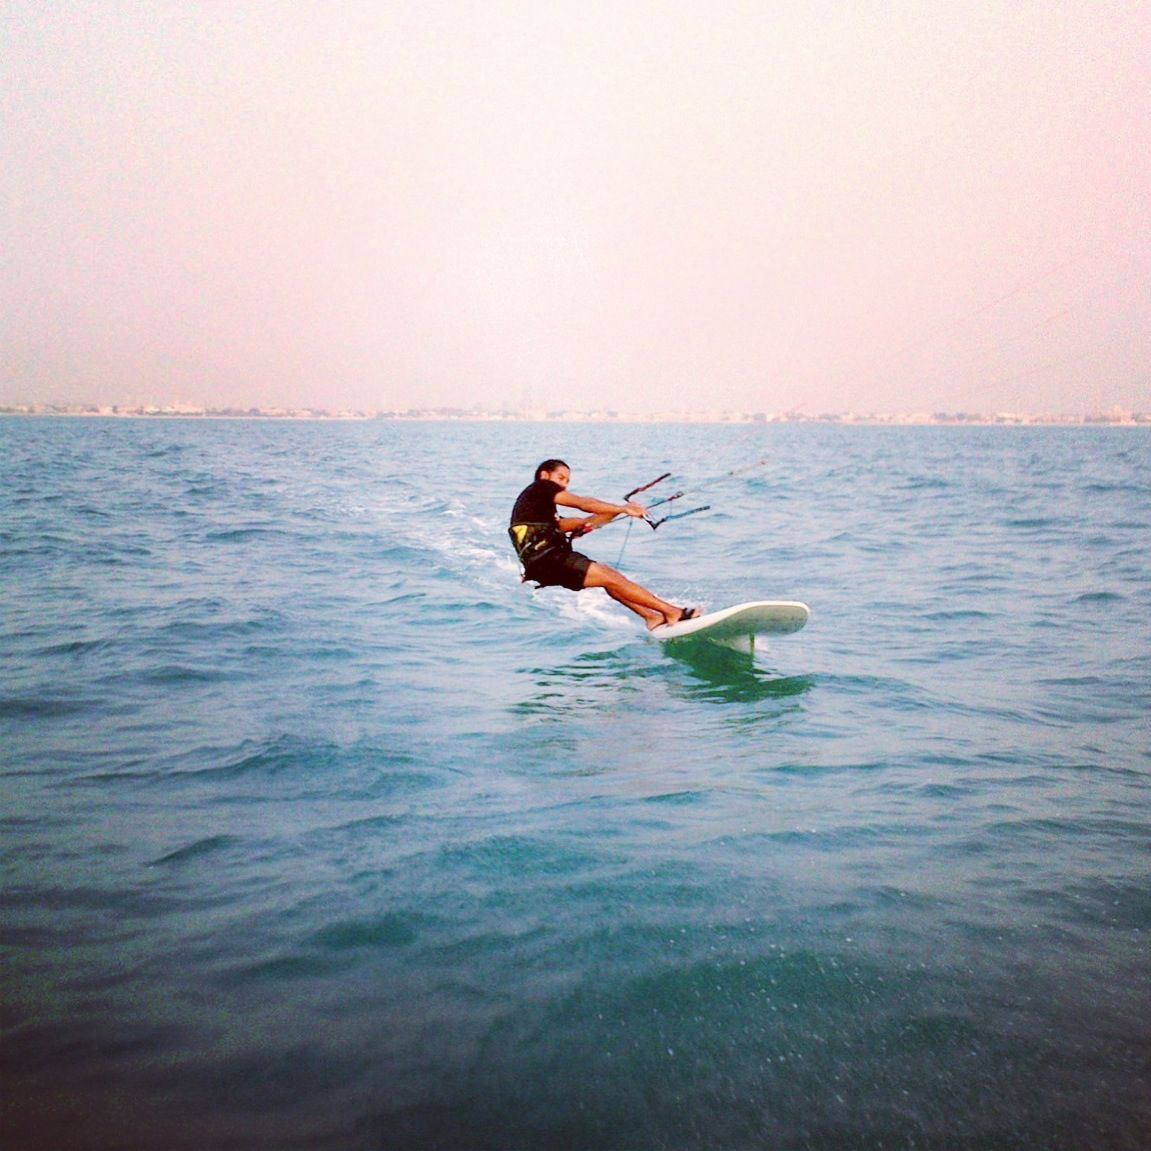 Kiteboard racing in Dubai around the World Islands